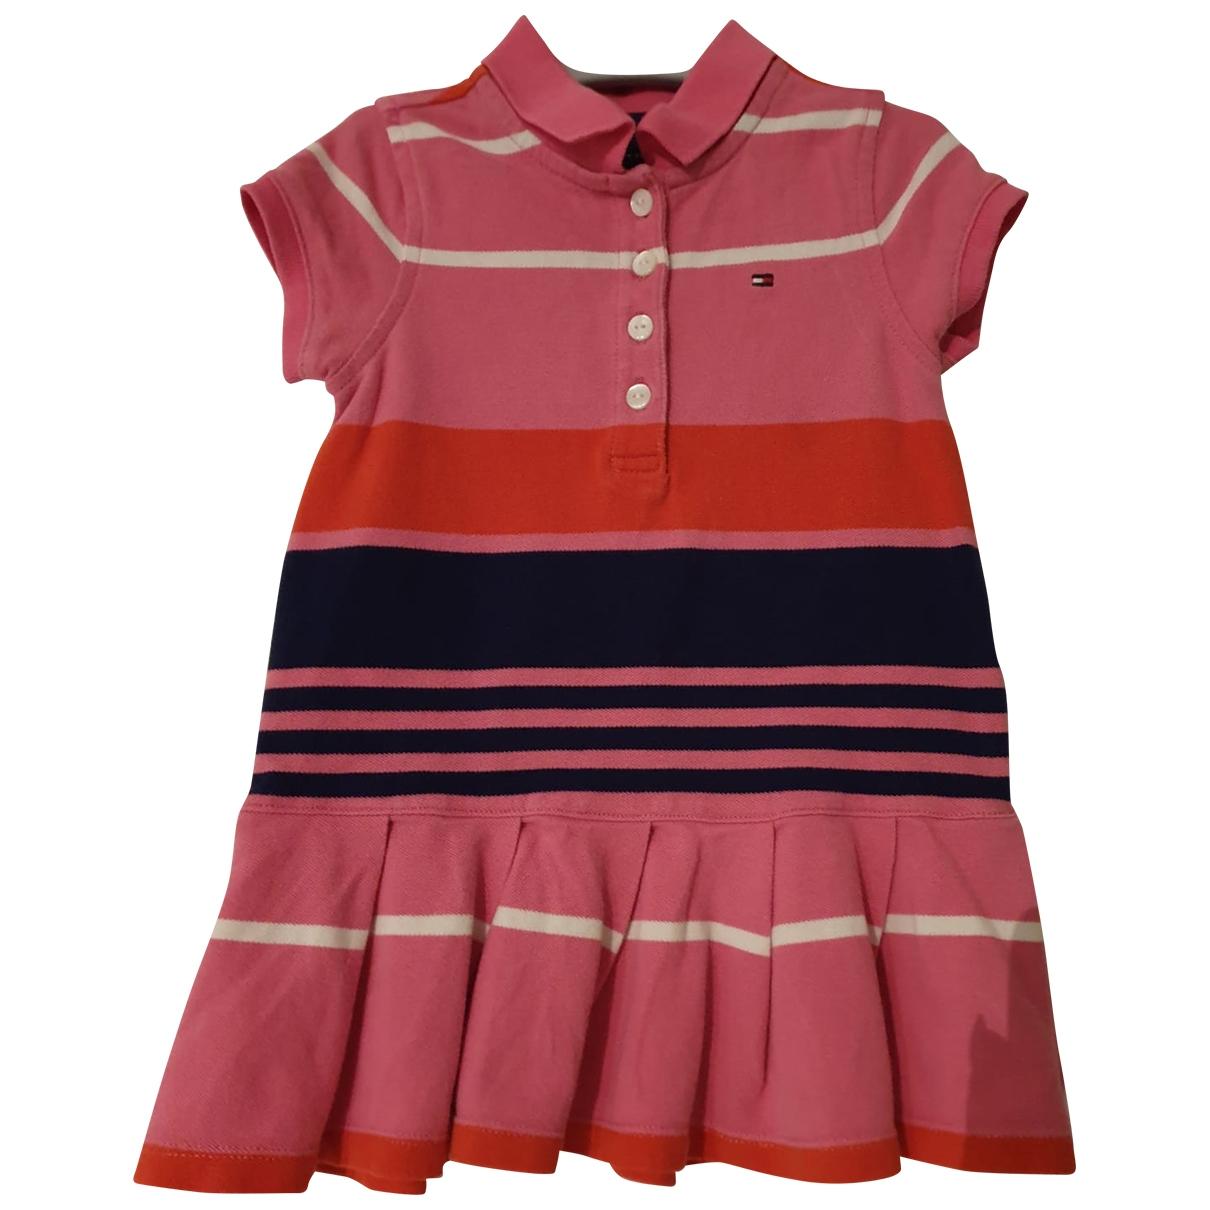 Tommy Hilfiger \N Multicolour Cotton dress for Kids 12 months - up to 74cm FR